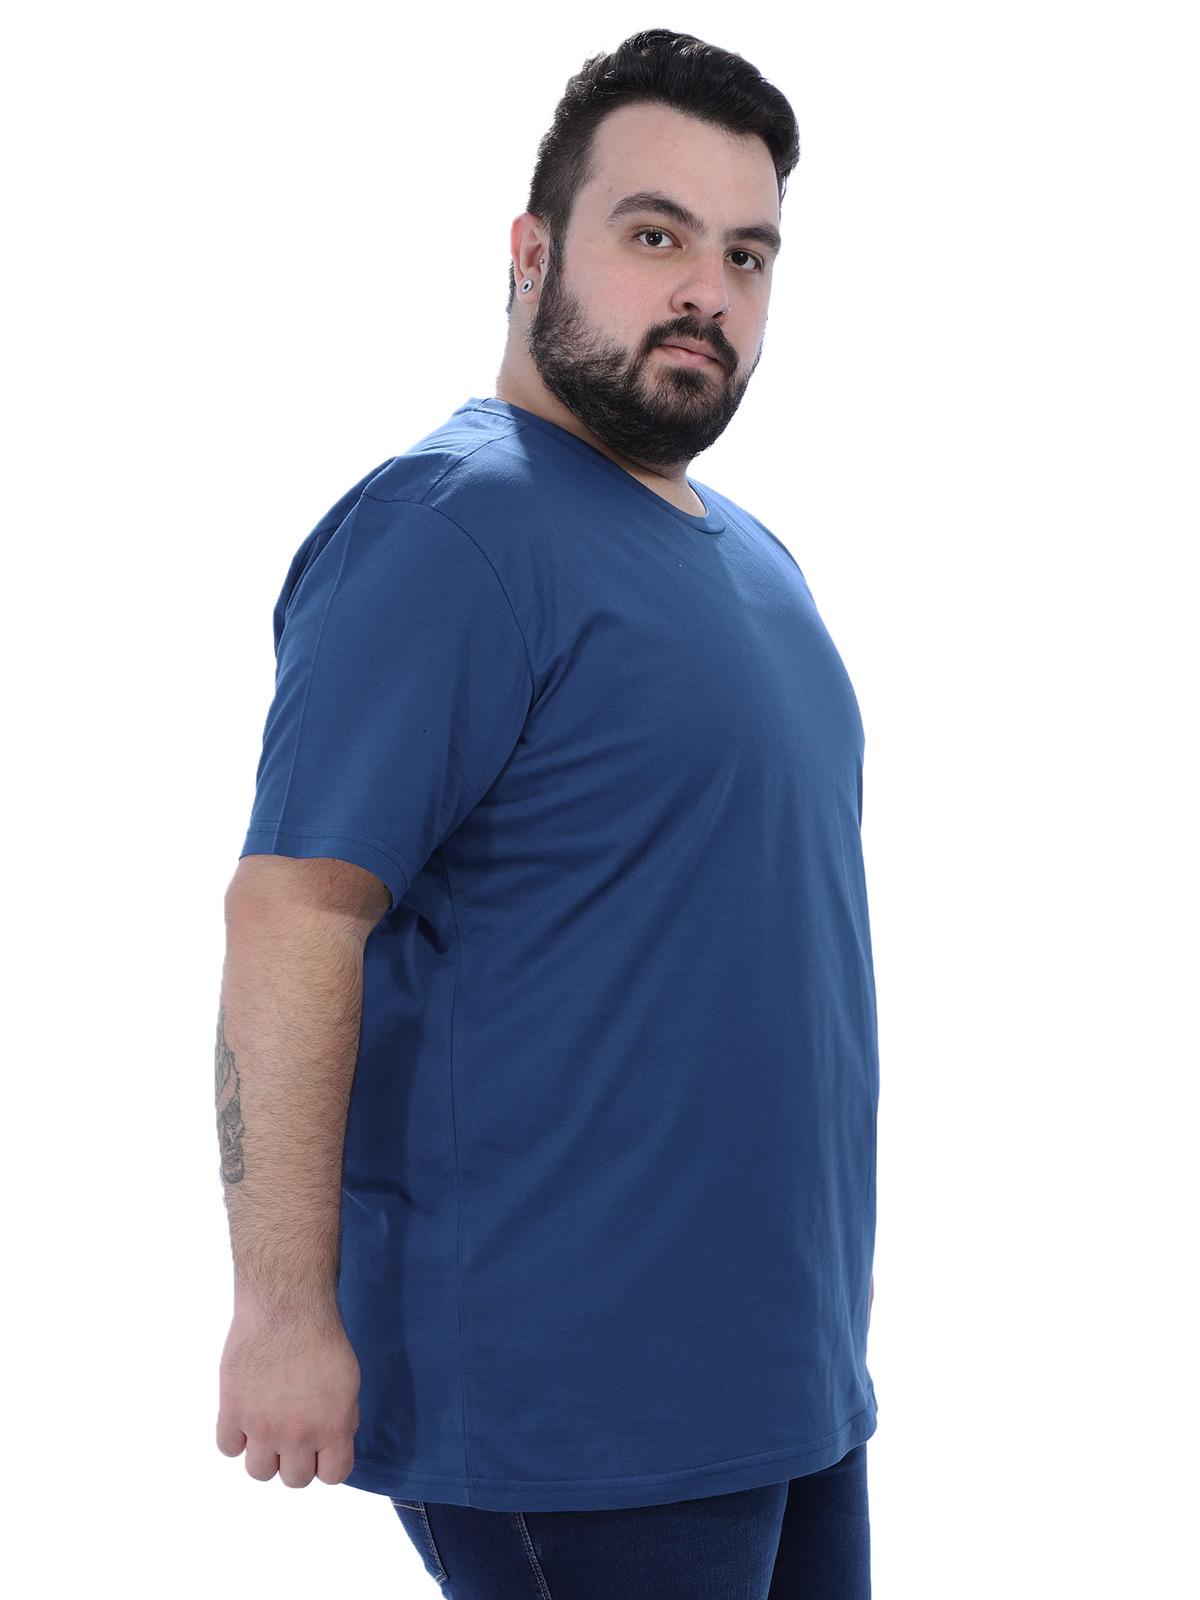 Camiseta Plus Size Lisa Masculino Básica Algodão Azul Jeans